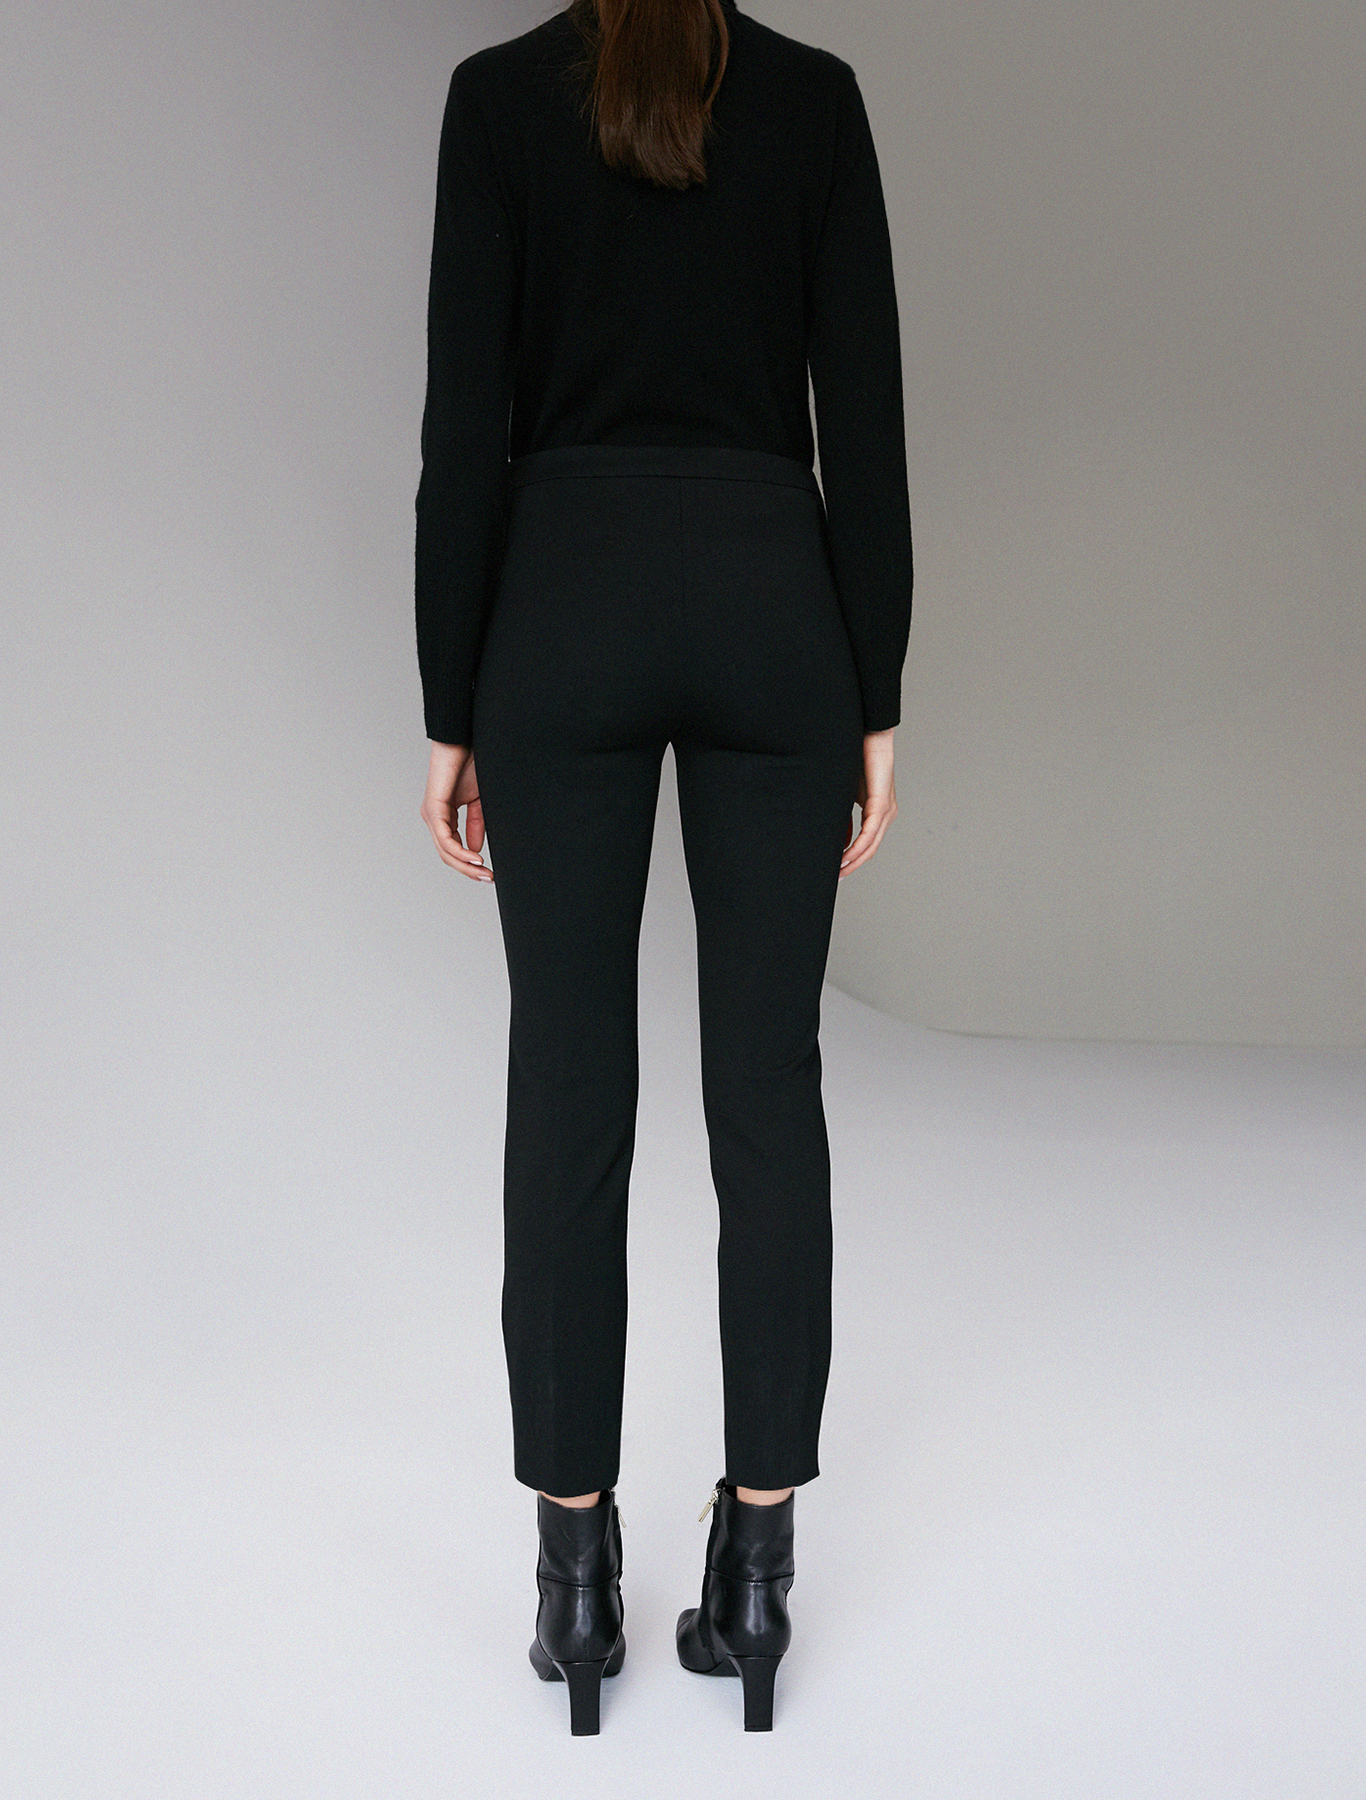 Stretch jersey slim trousers - black - pennyblack